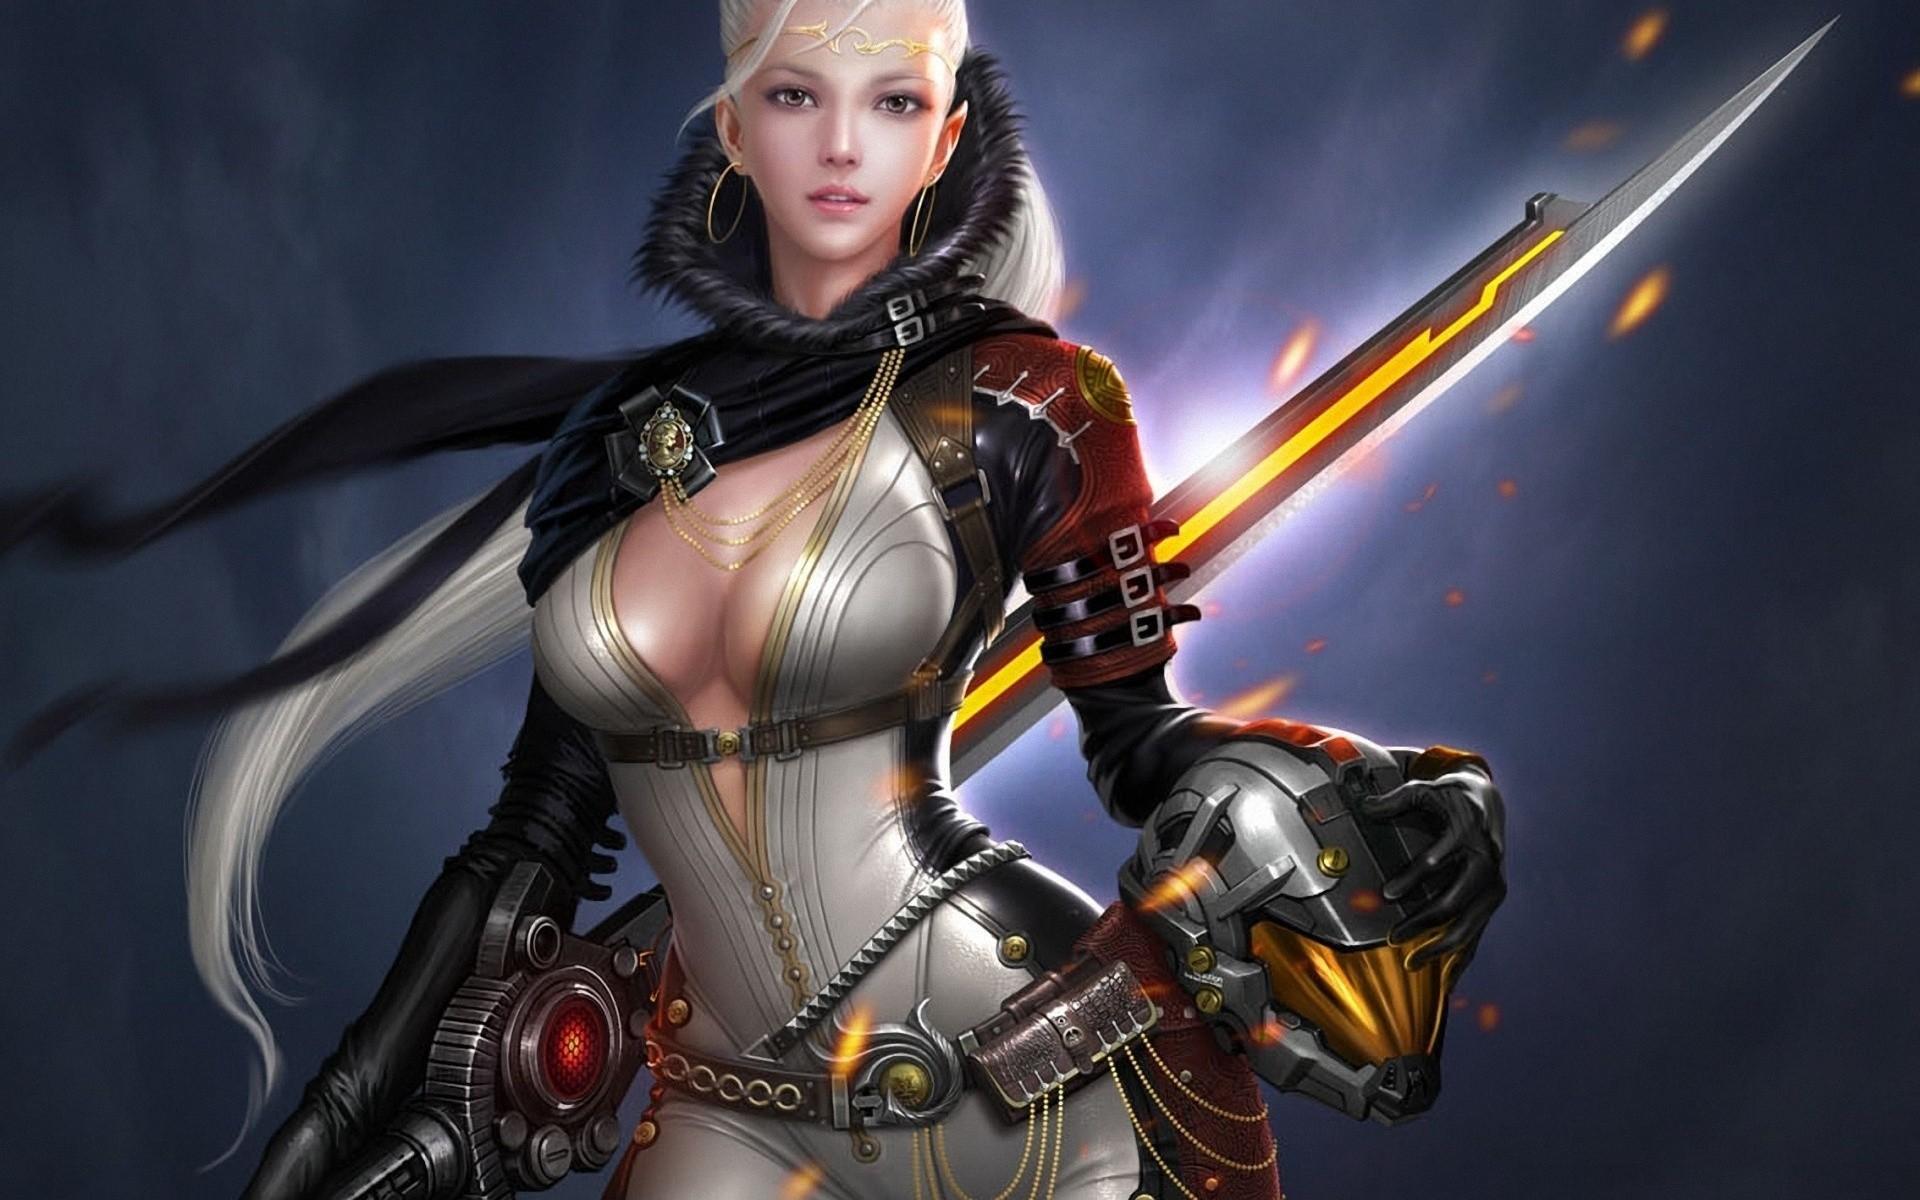 Sexy girl knight xxx photos